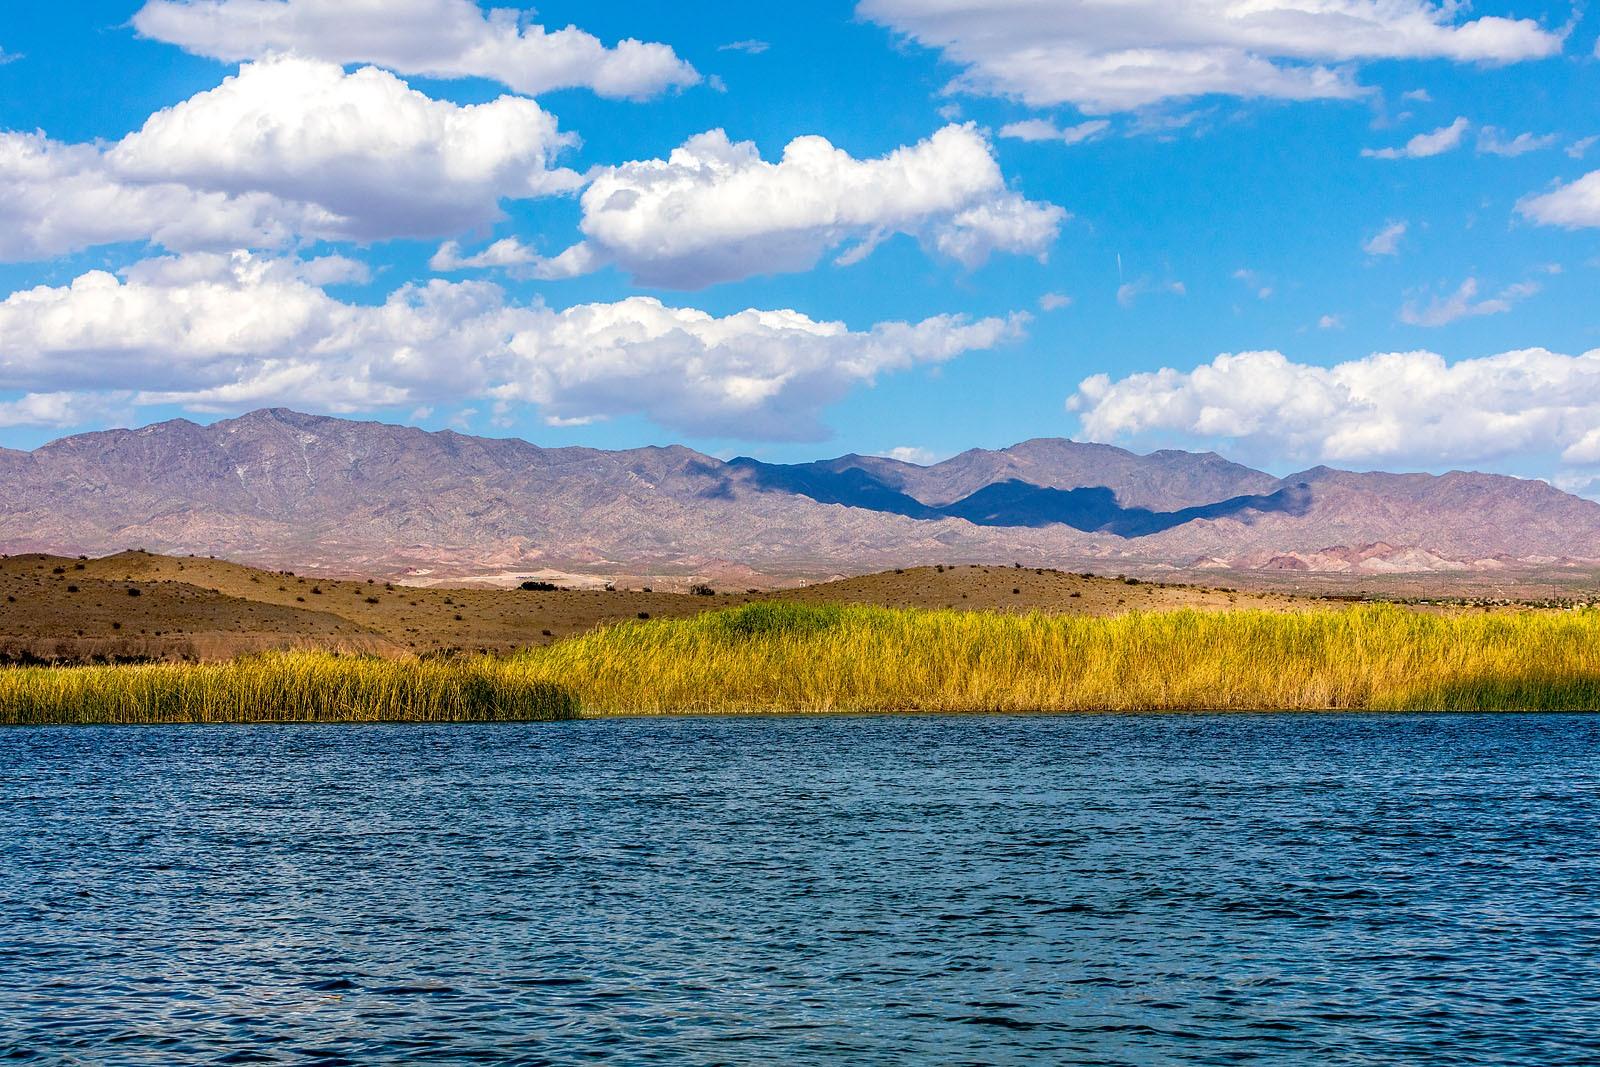 Colorado River Lake Havasu Arizona MG_1455_